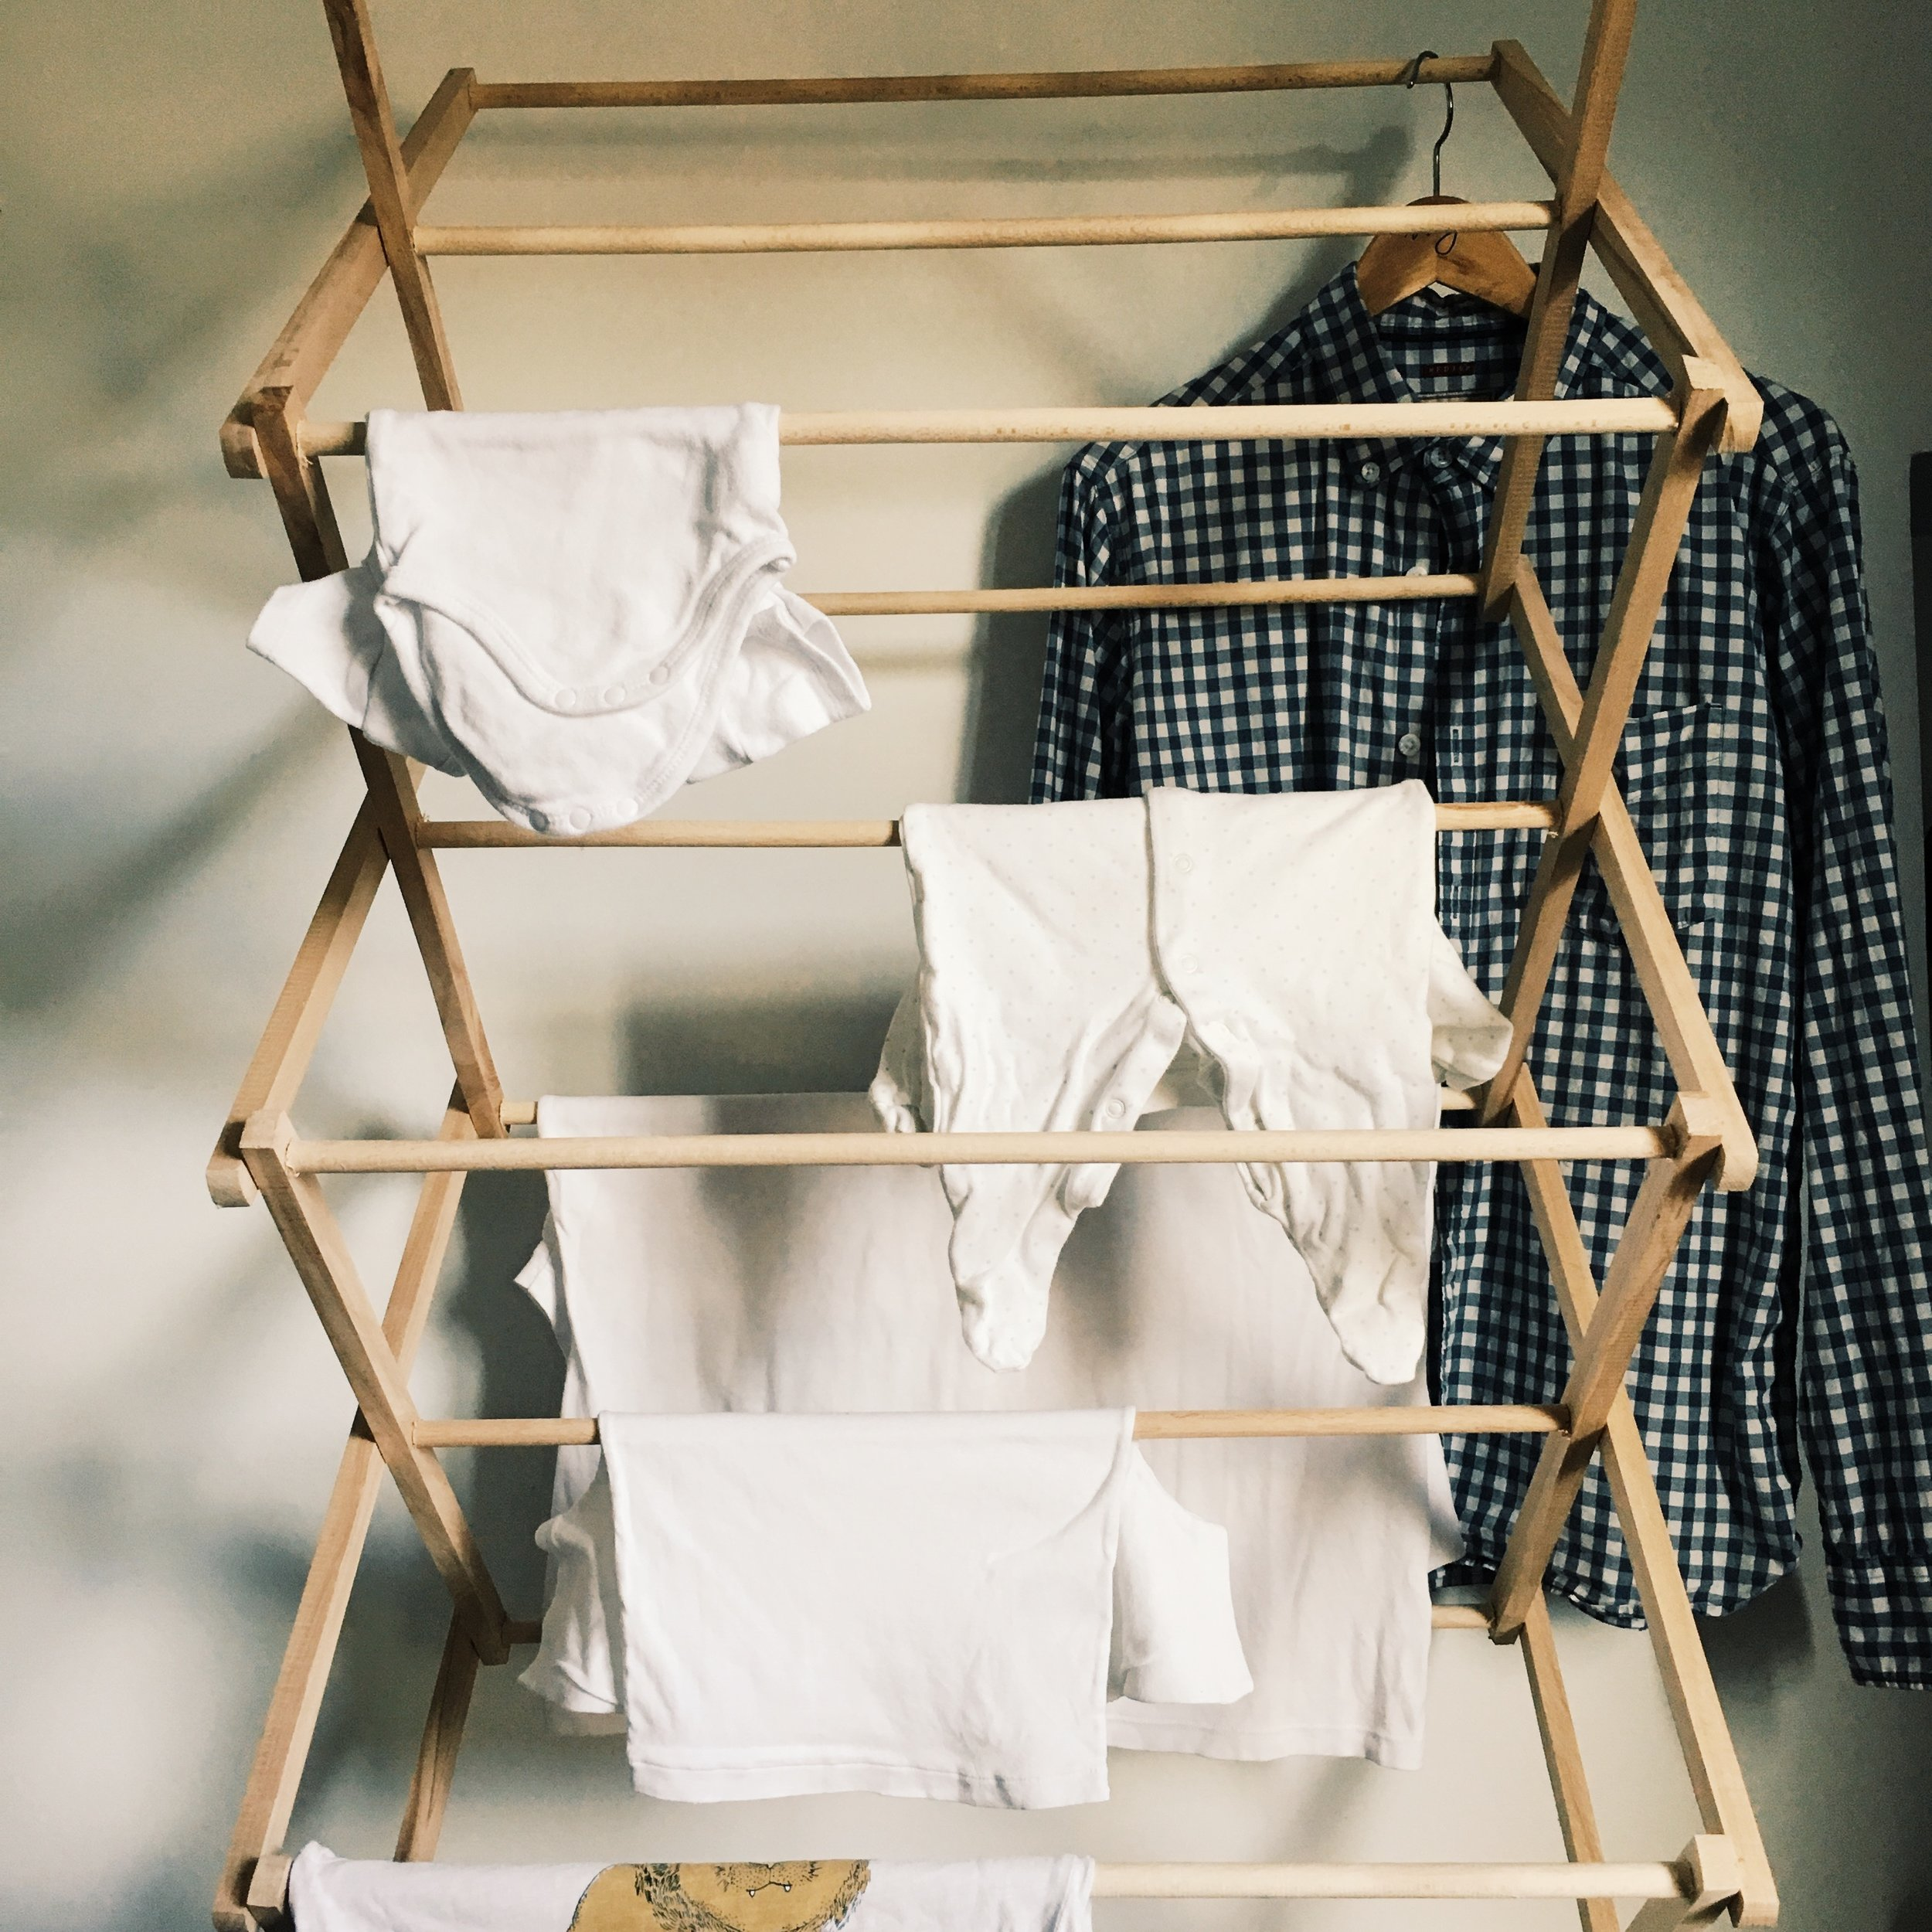 Laundryrack.jpg